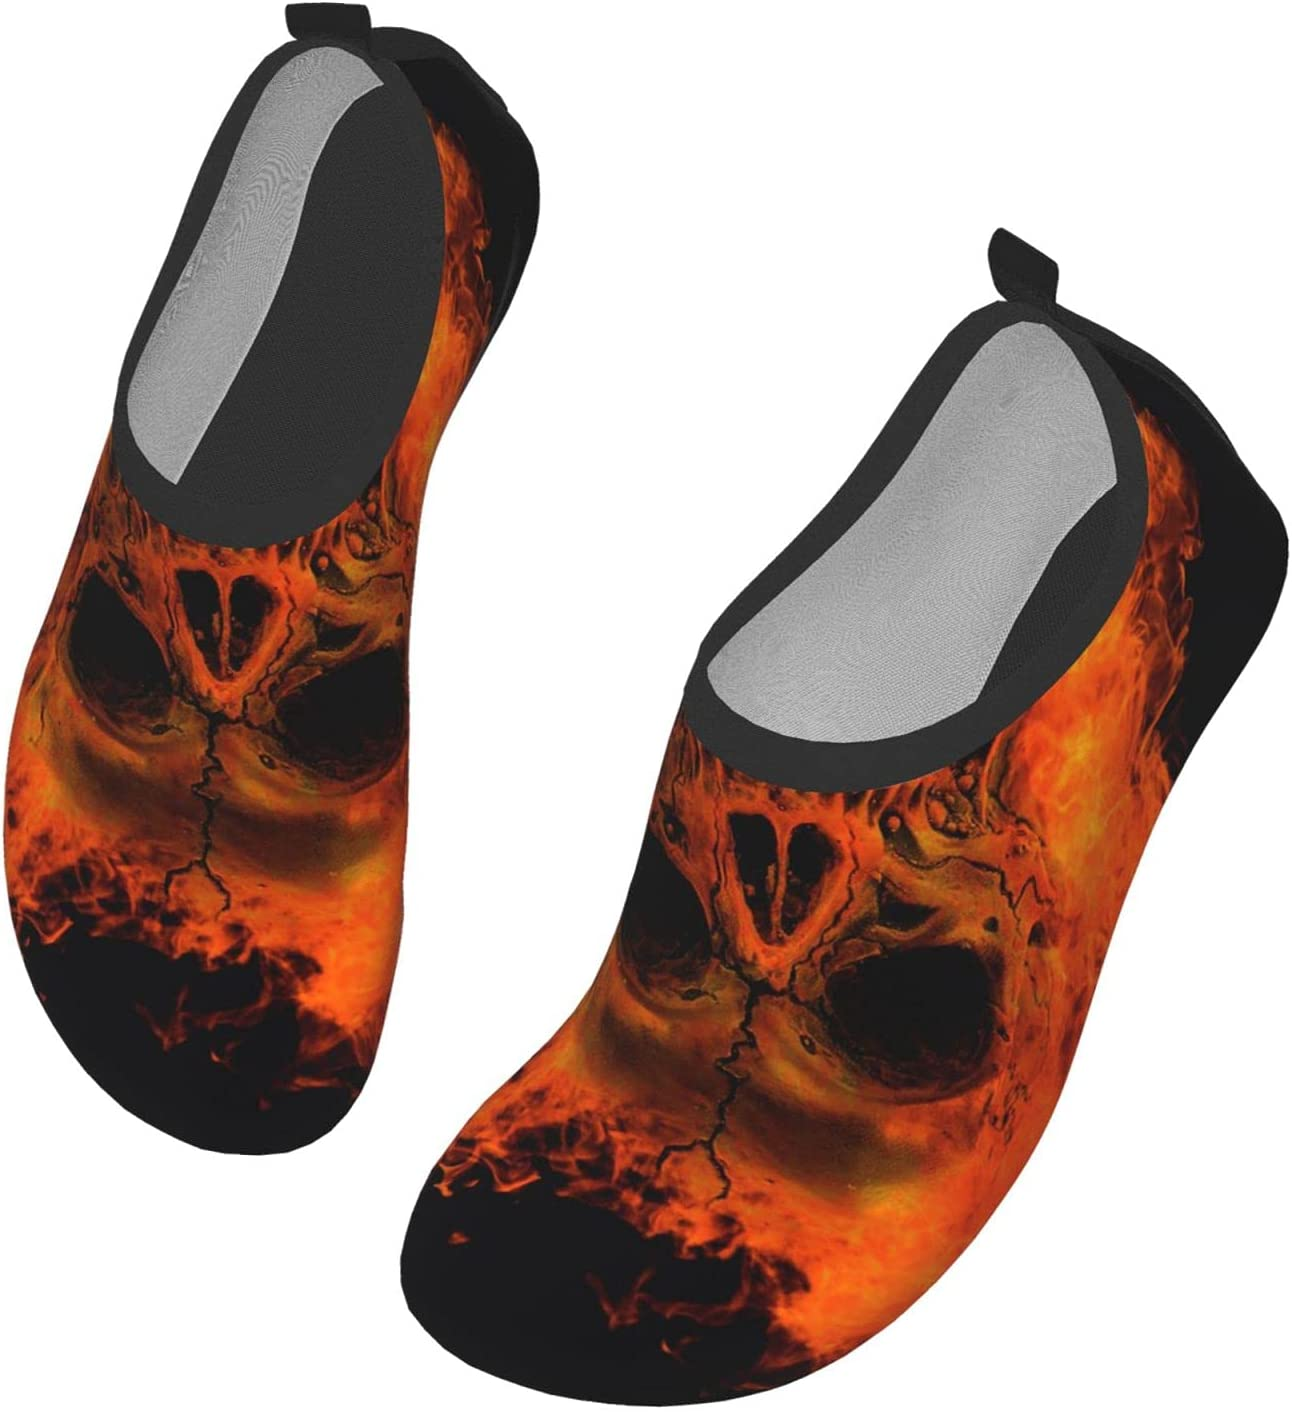 Womens Mens Summer Water Shoes Cool Blood Red Fire Skull Barefoot Shoe Quick Dry Aqua Socks